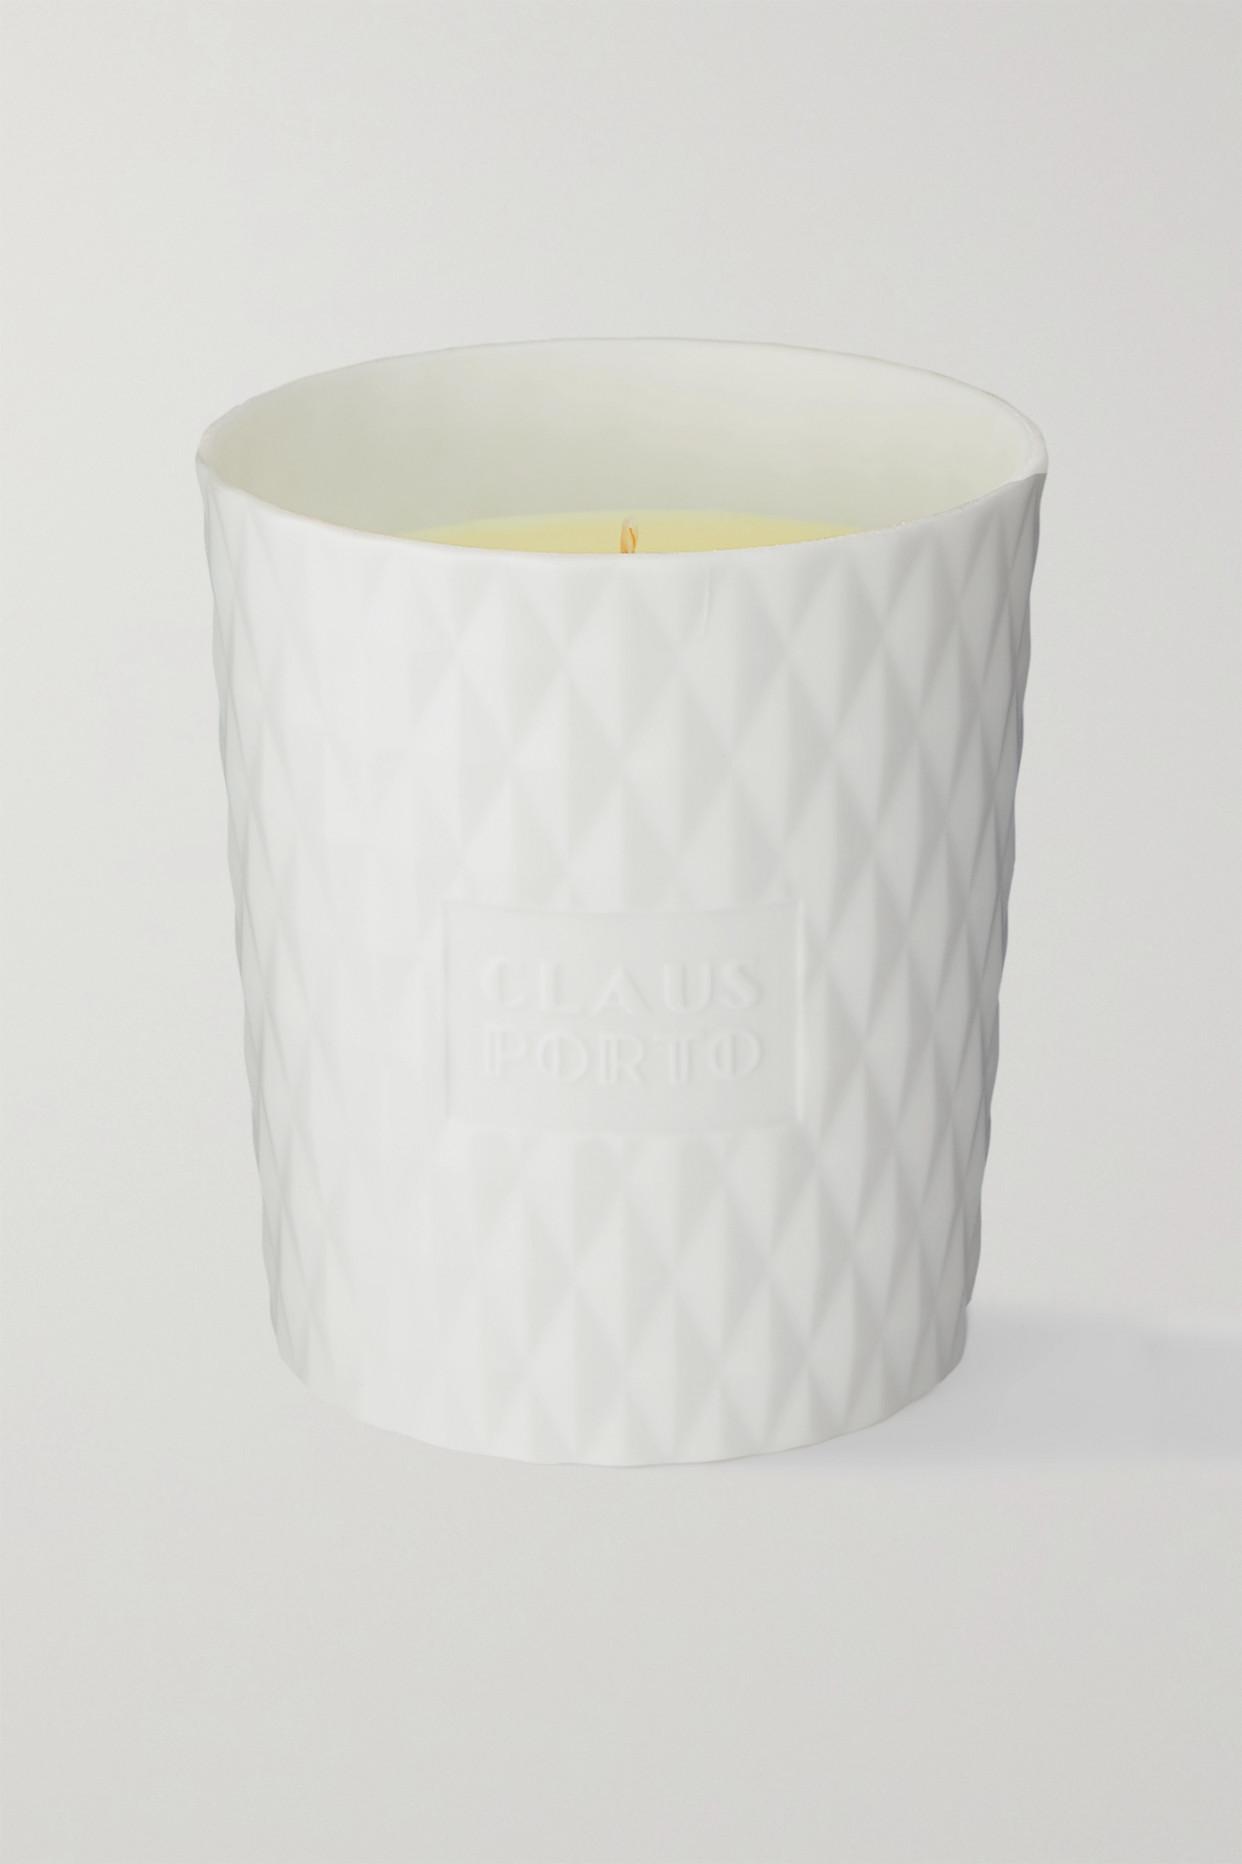 CLAUS PORTO - Voga Scented Candle - Acacia Tuberose, 270g - one size